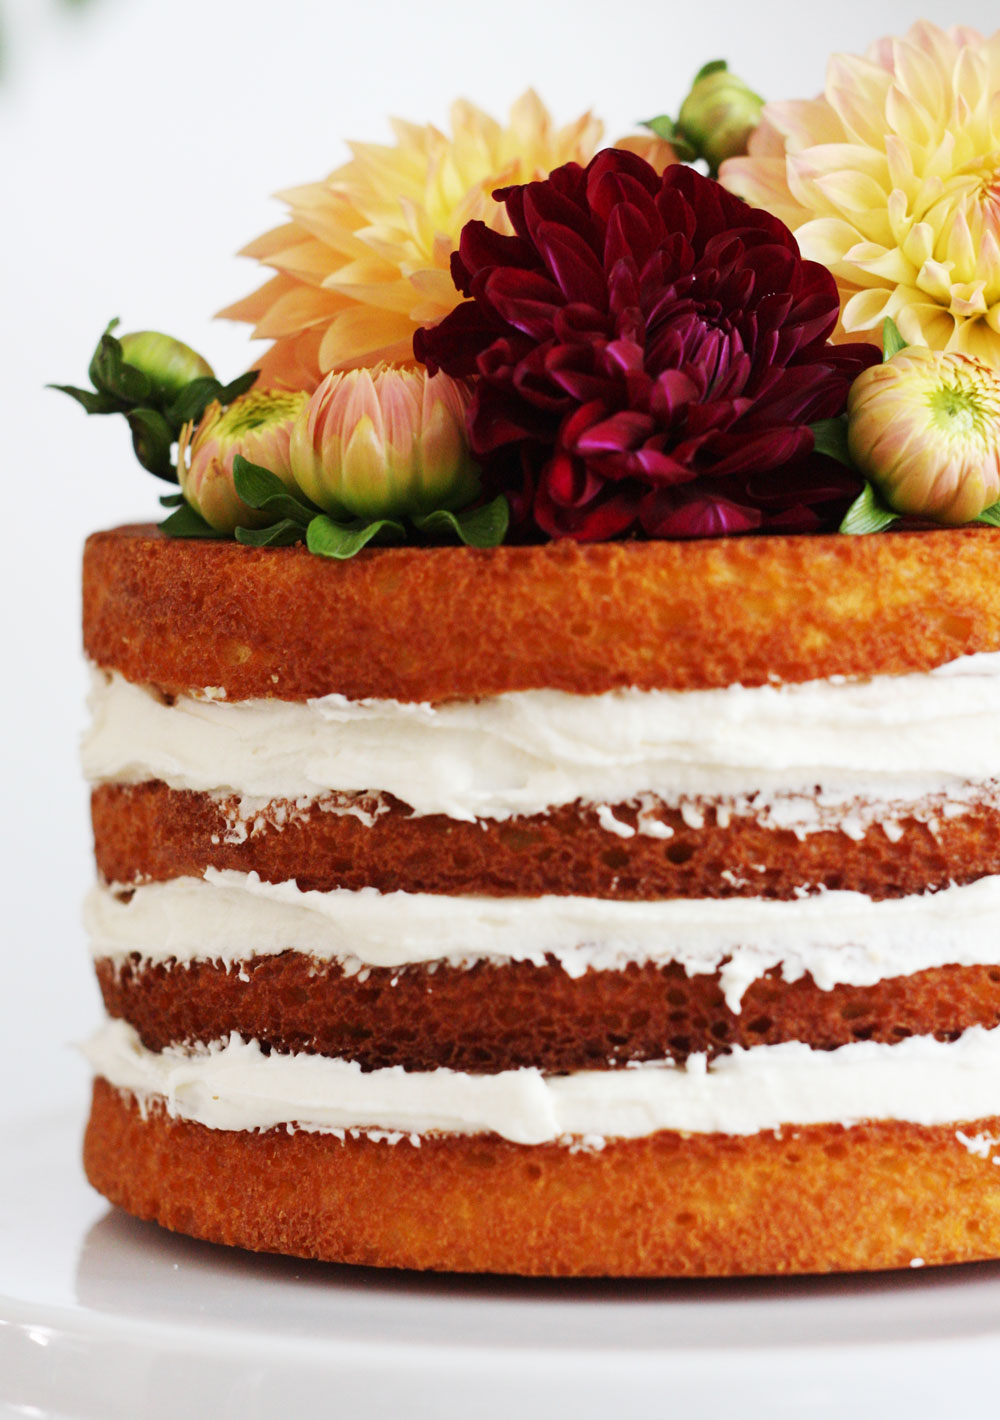 jestcafe.com-babyshower-and-naked-cake18